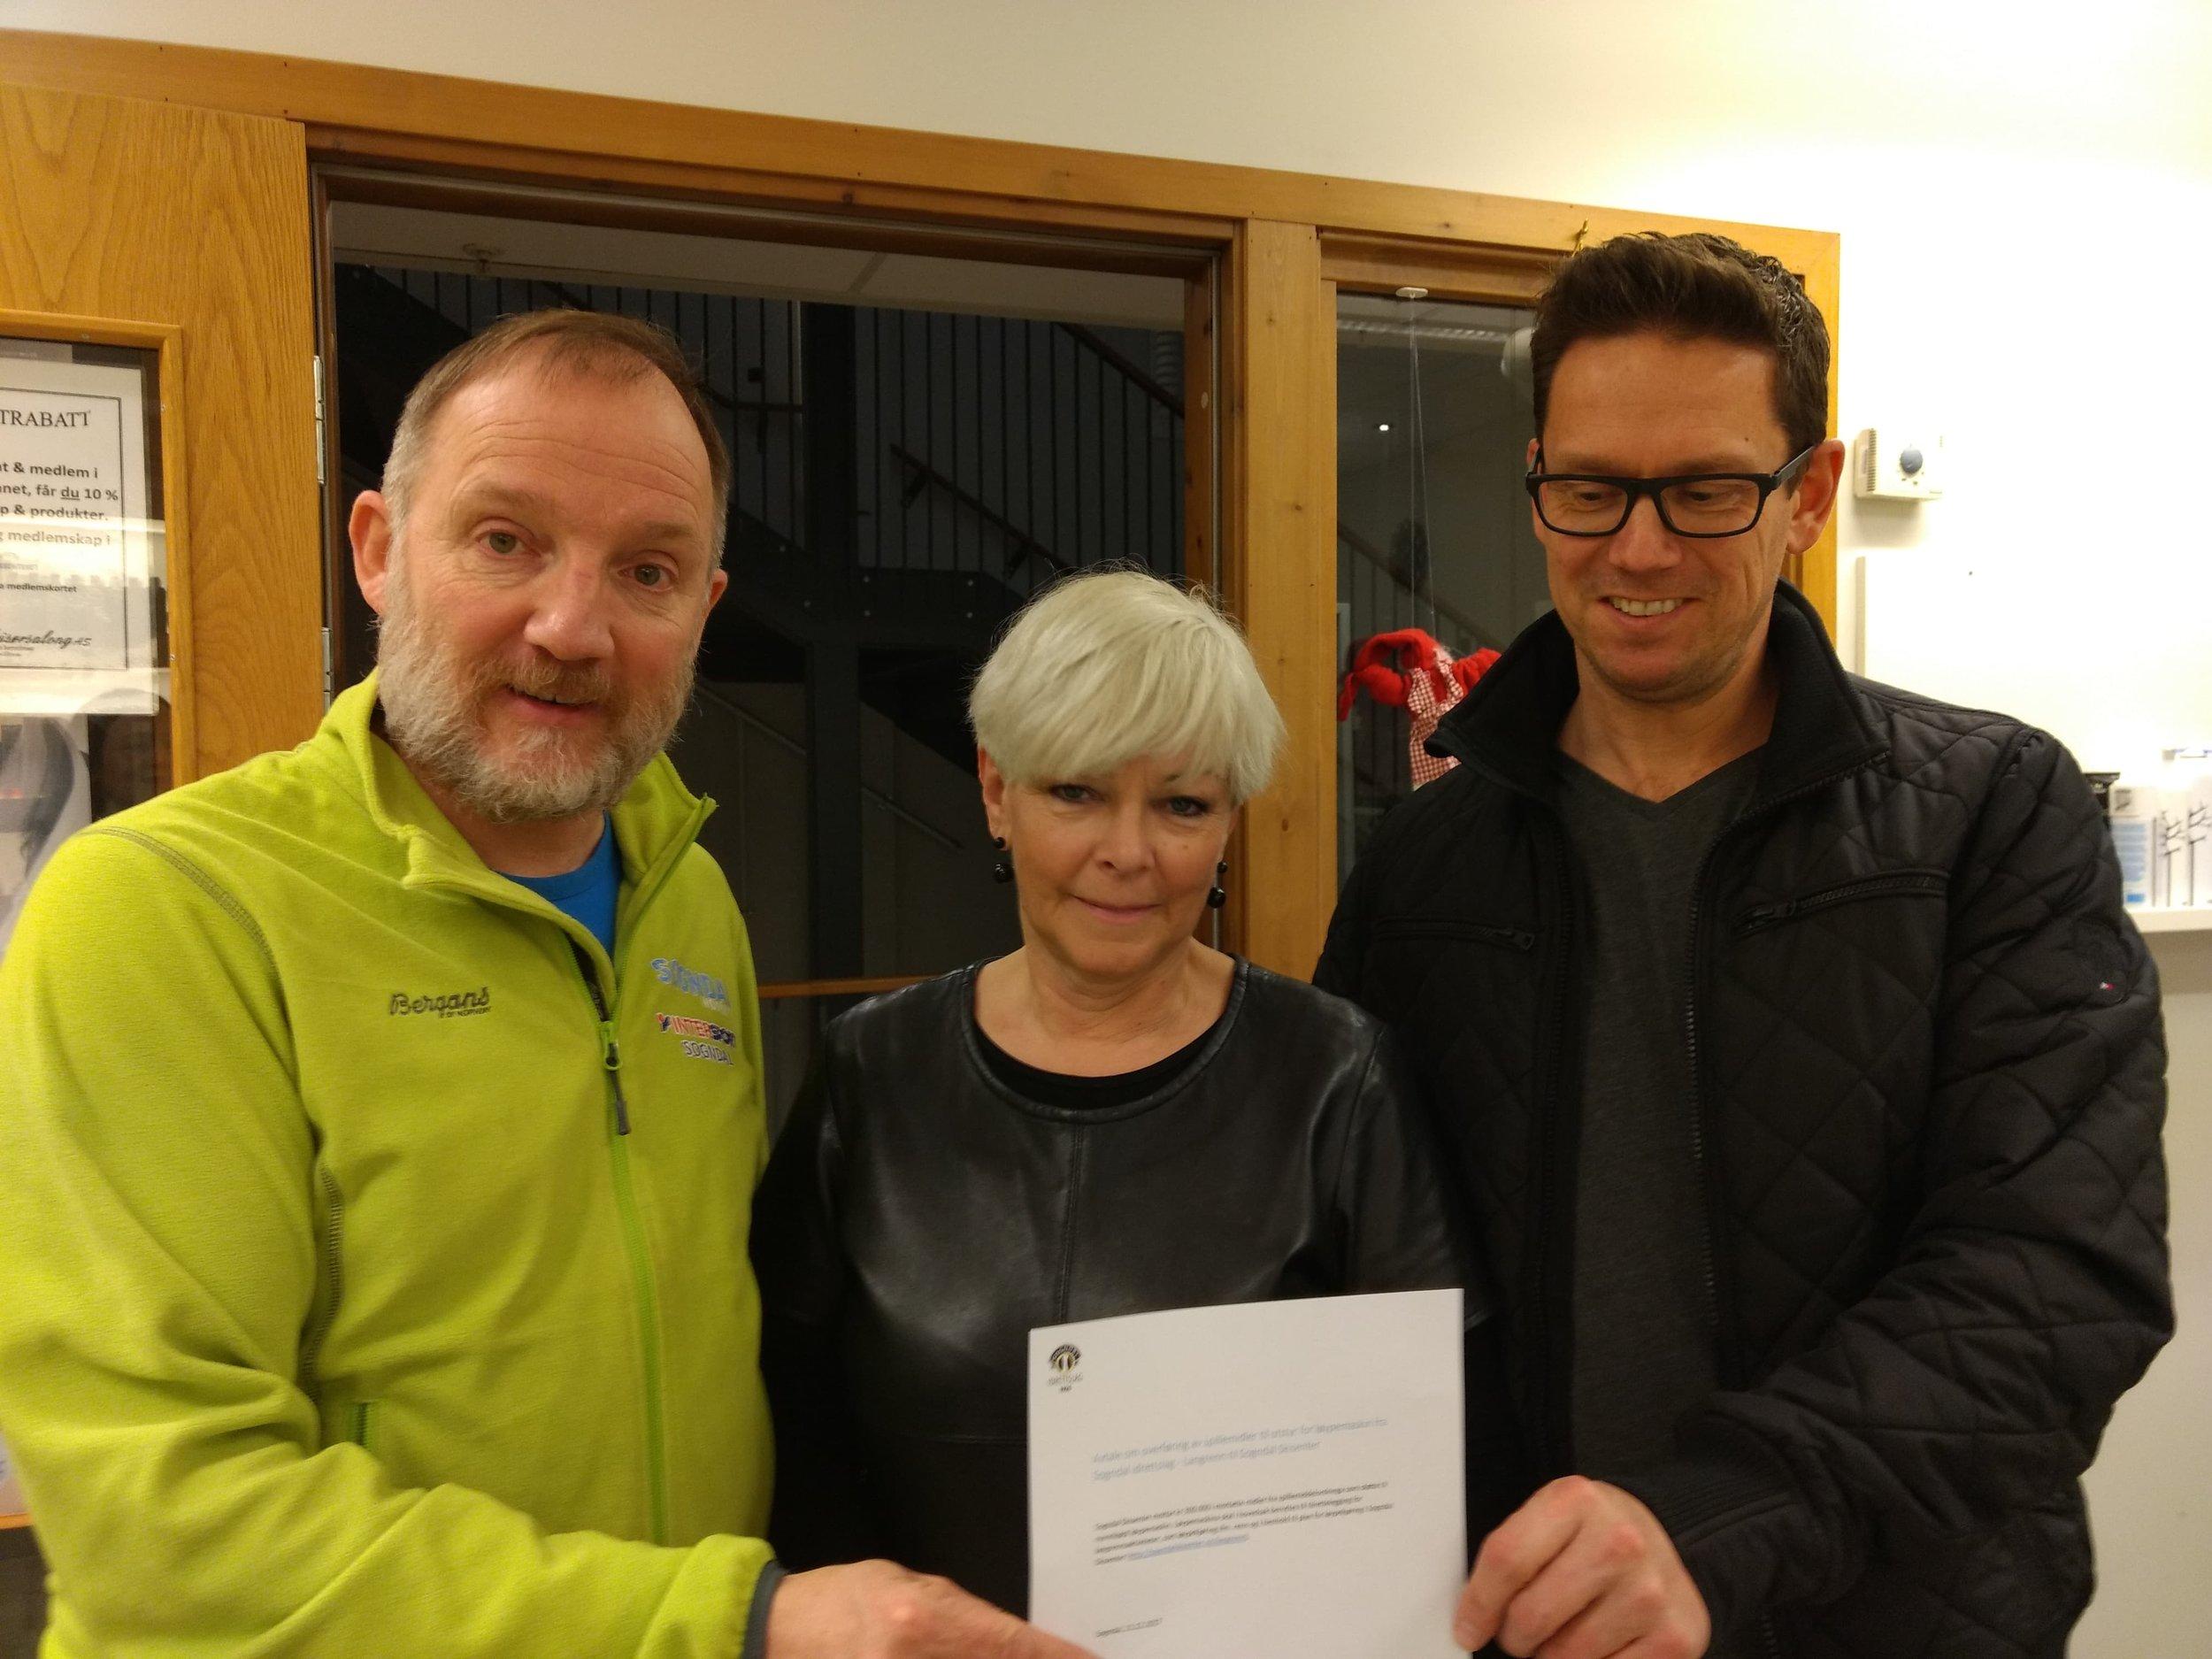 Per Odd Grevsnes, får overrekt gåva frå idretten på kr 300 00 frå på Lilly Schøen og Tommy Harjo.